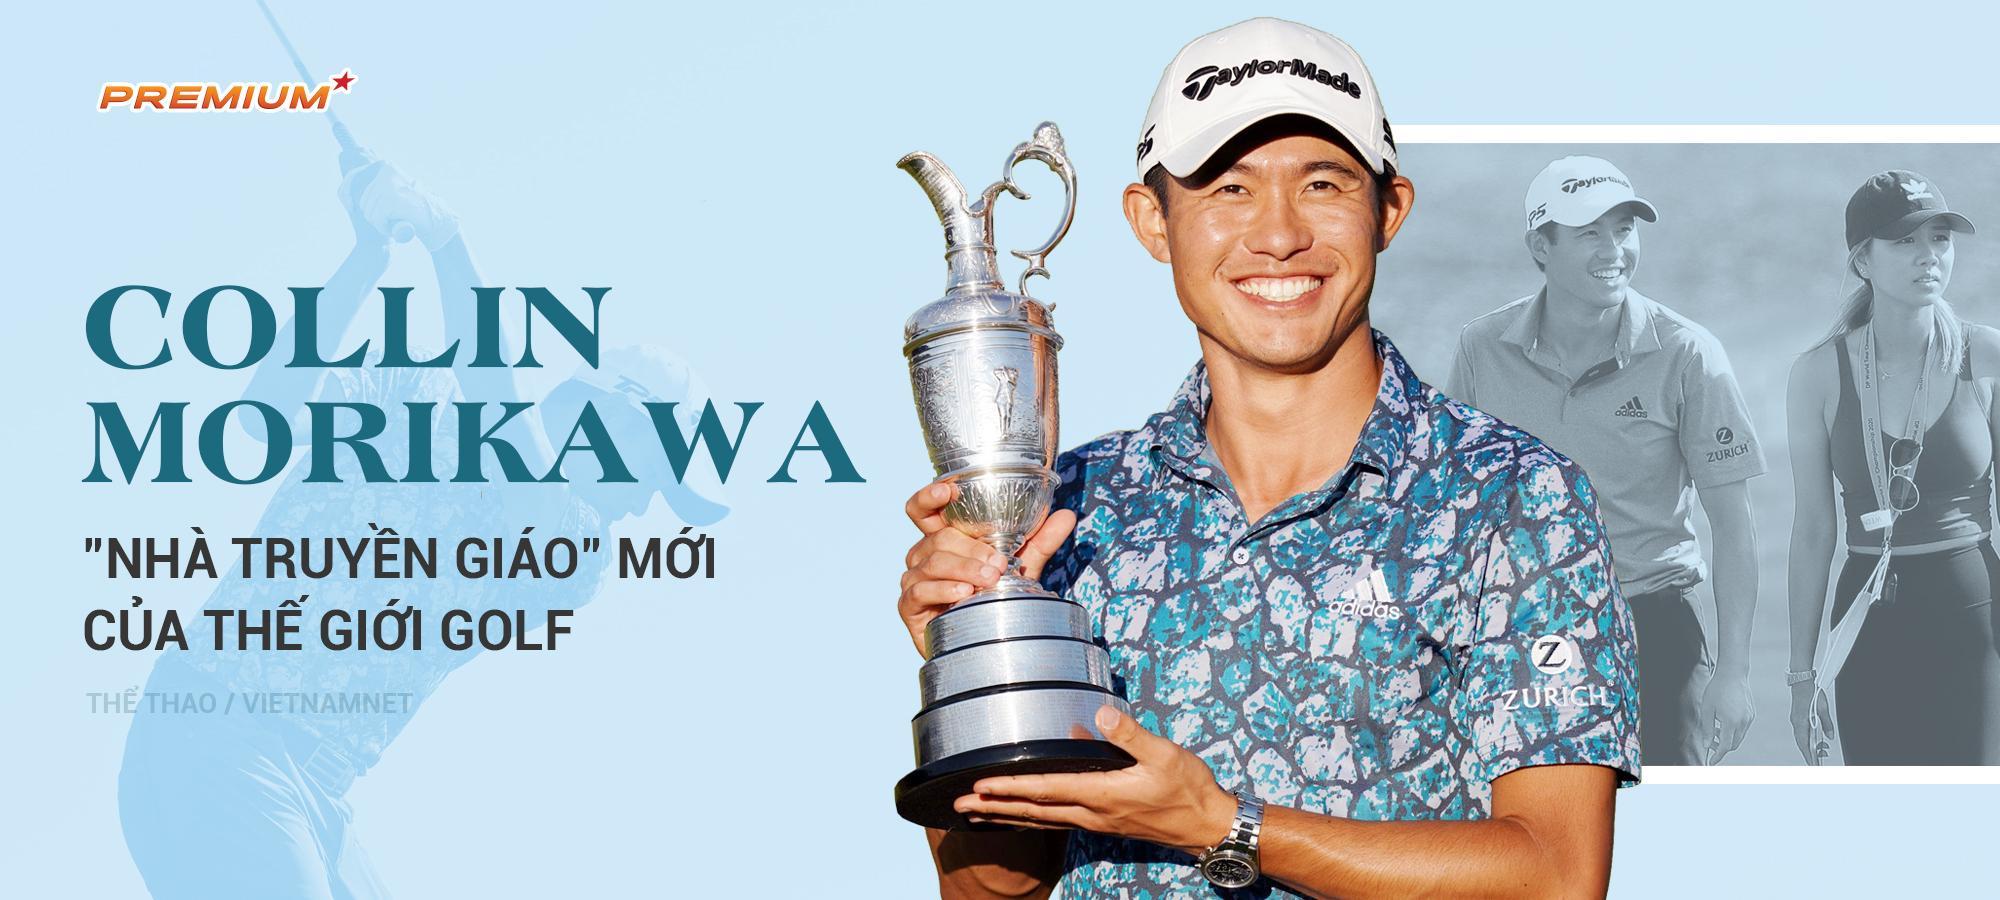 "Collin Morikawa: ""Nhà truyền giáo"" mới của thế giới golf"